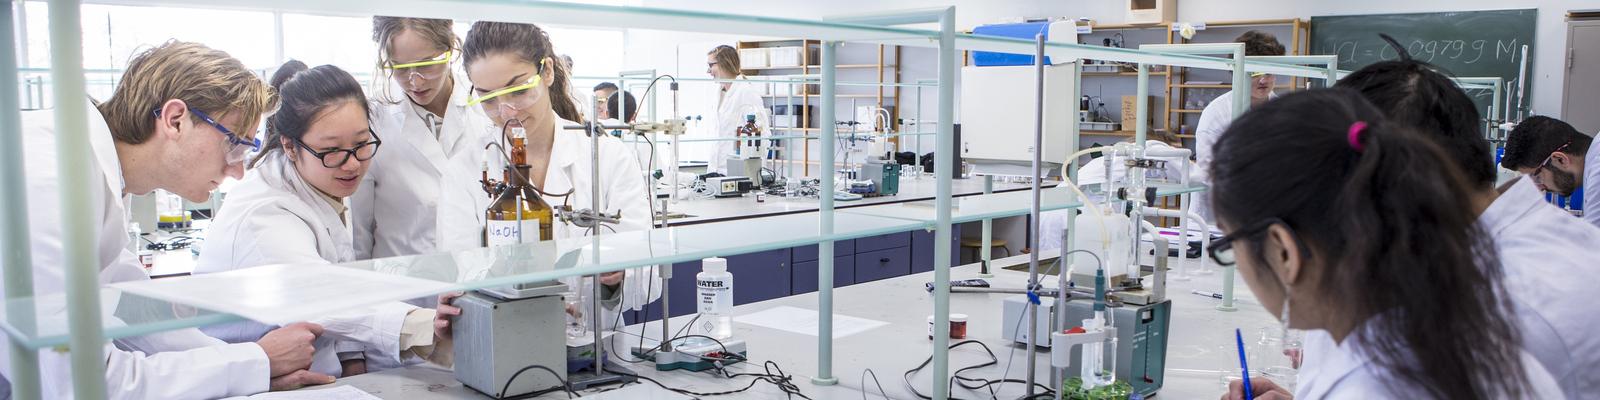 Growing Organs in the Lab (16 januari 2020)